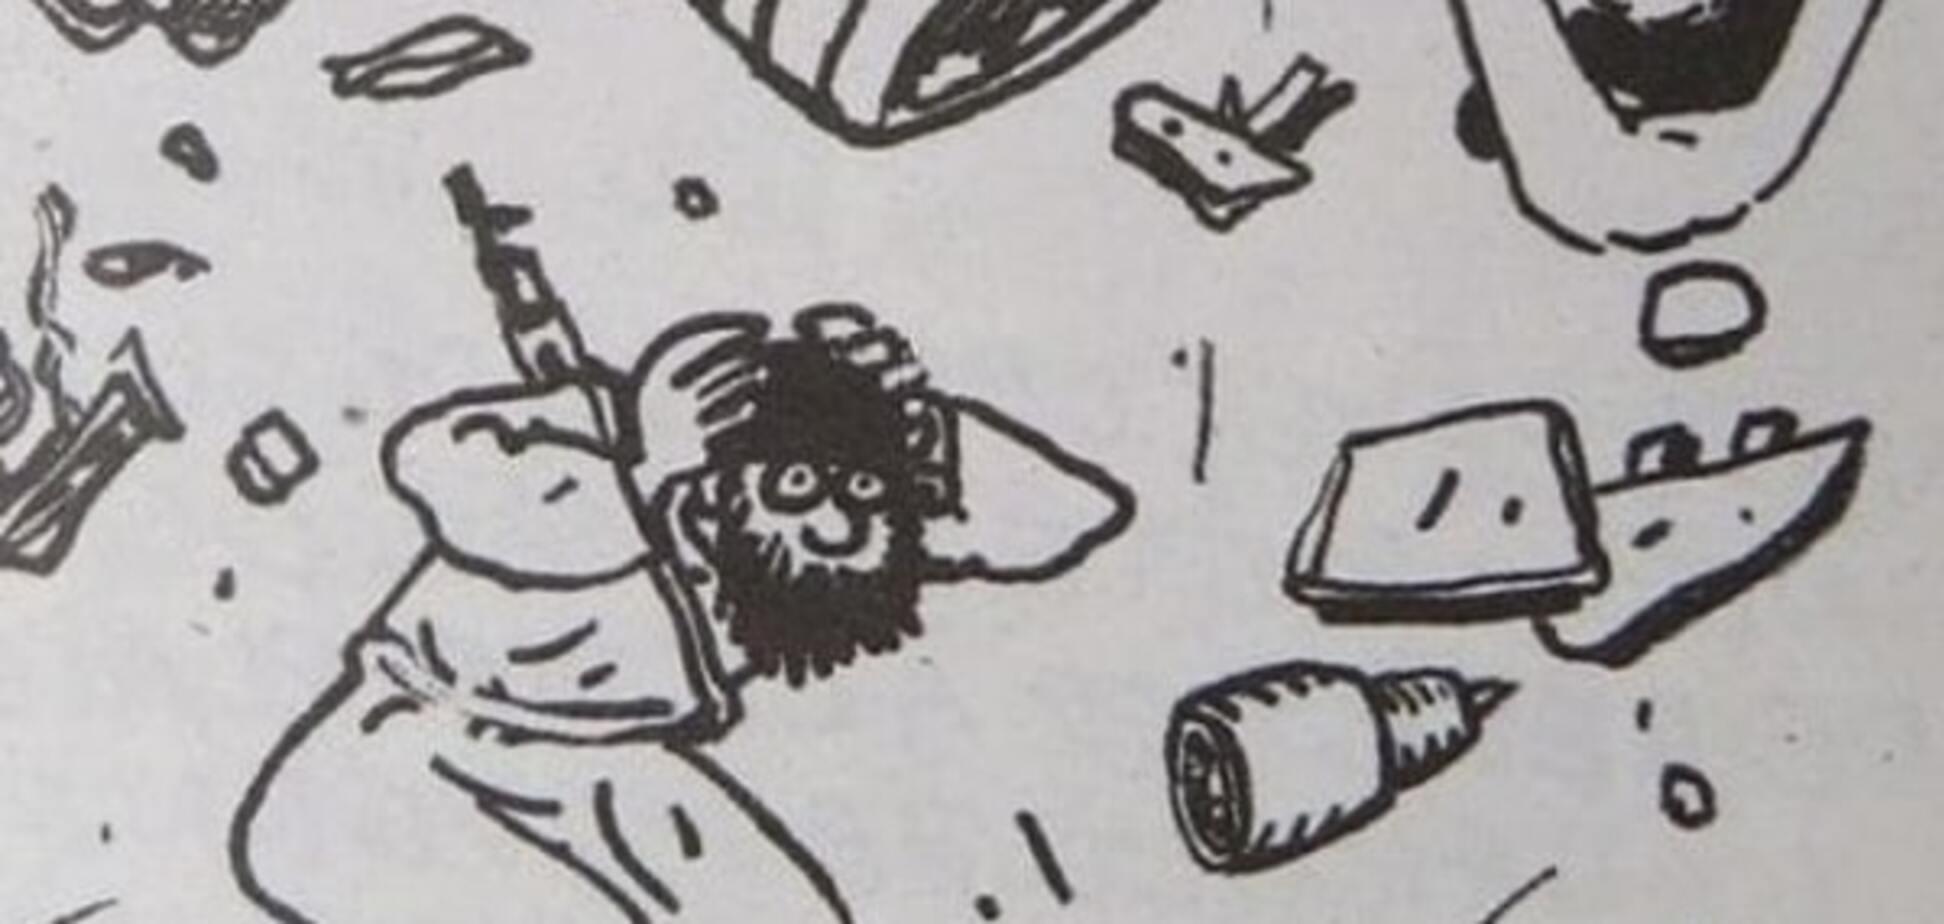 'Перешли все грани': в Госдуме раскритиковали карикатуру Charlie Hebdo